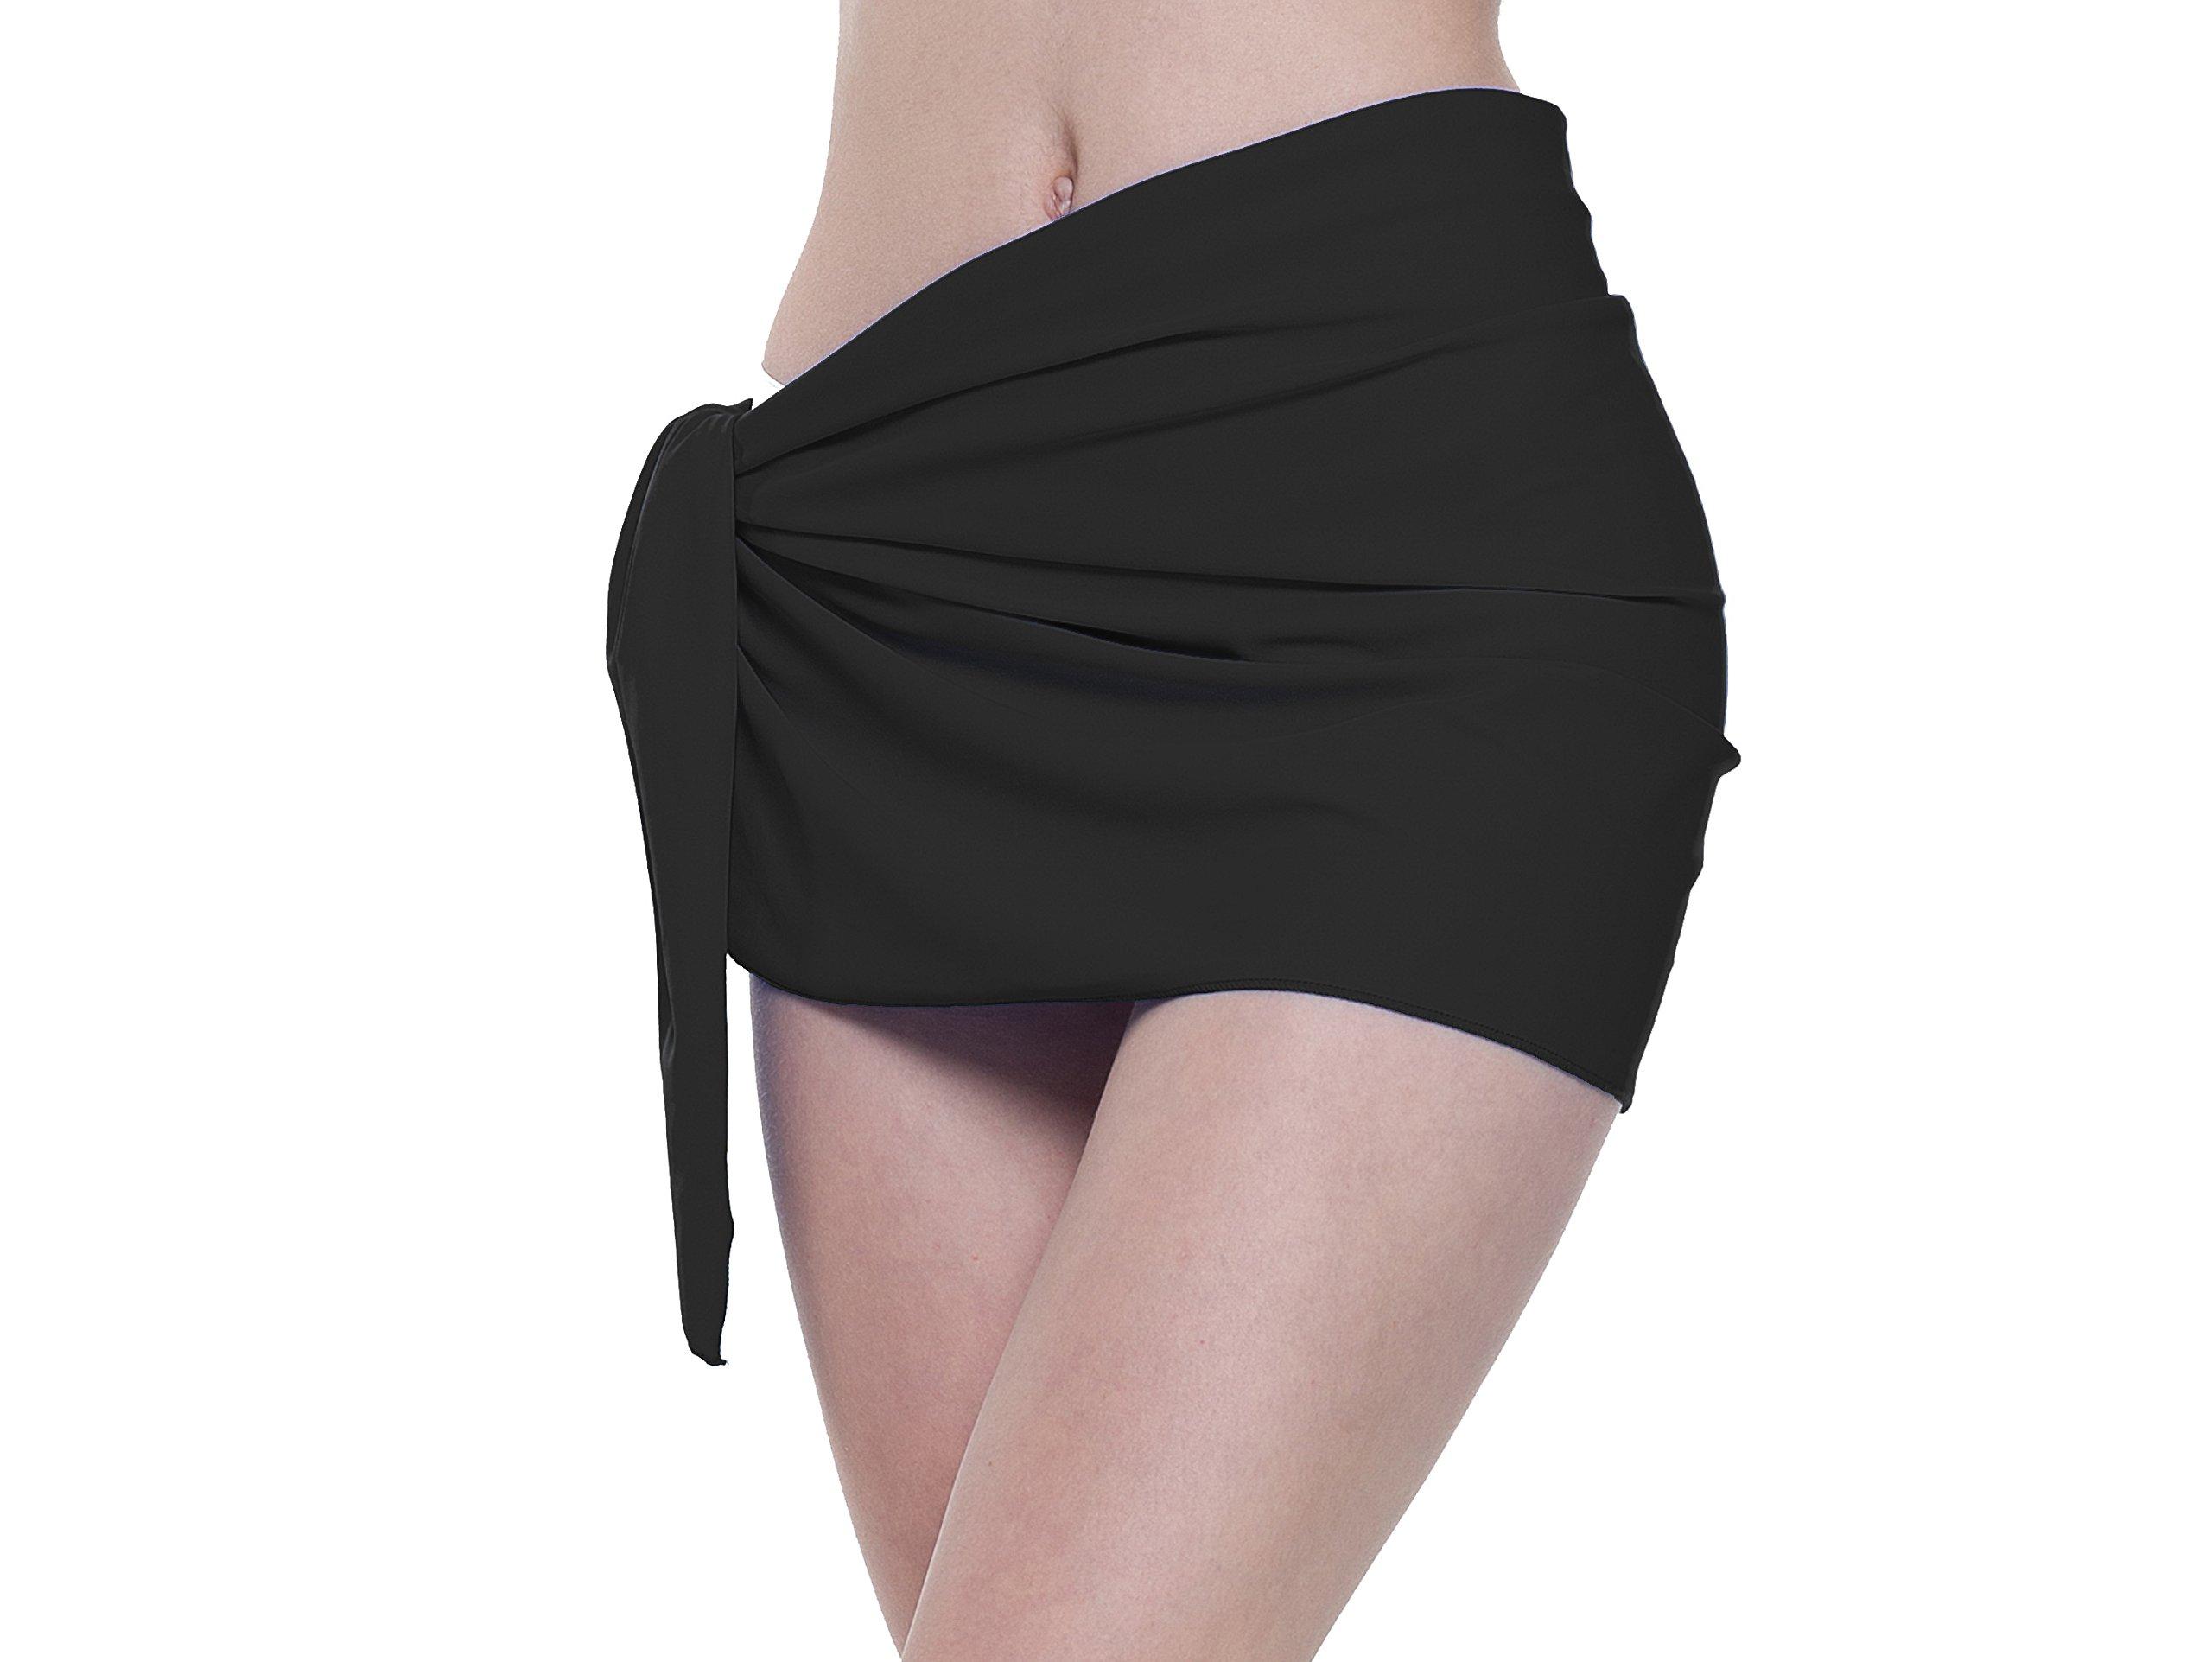 Sythyee Women's Sarong Wrap Beach Swimwear Nylon Cover up Short Pareo Bikini Swimsuit Wrap Skirt Bathing Suit Nylon Solid Black